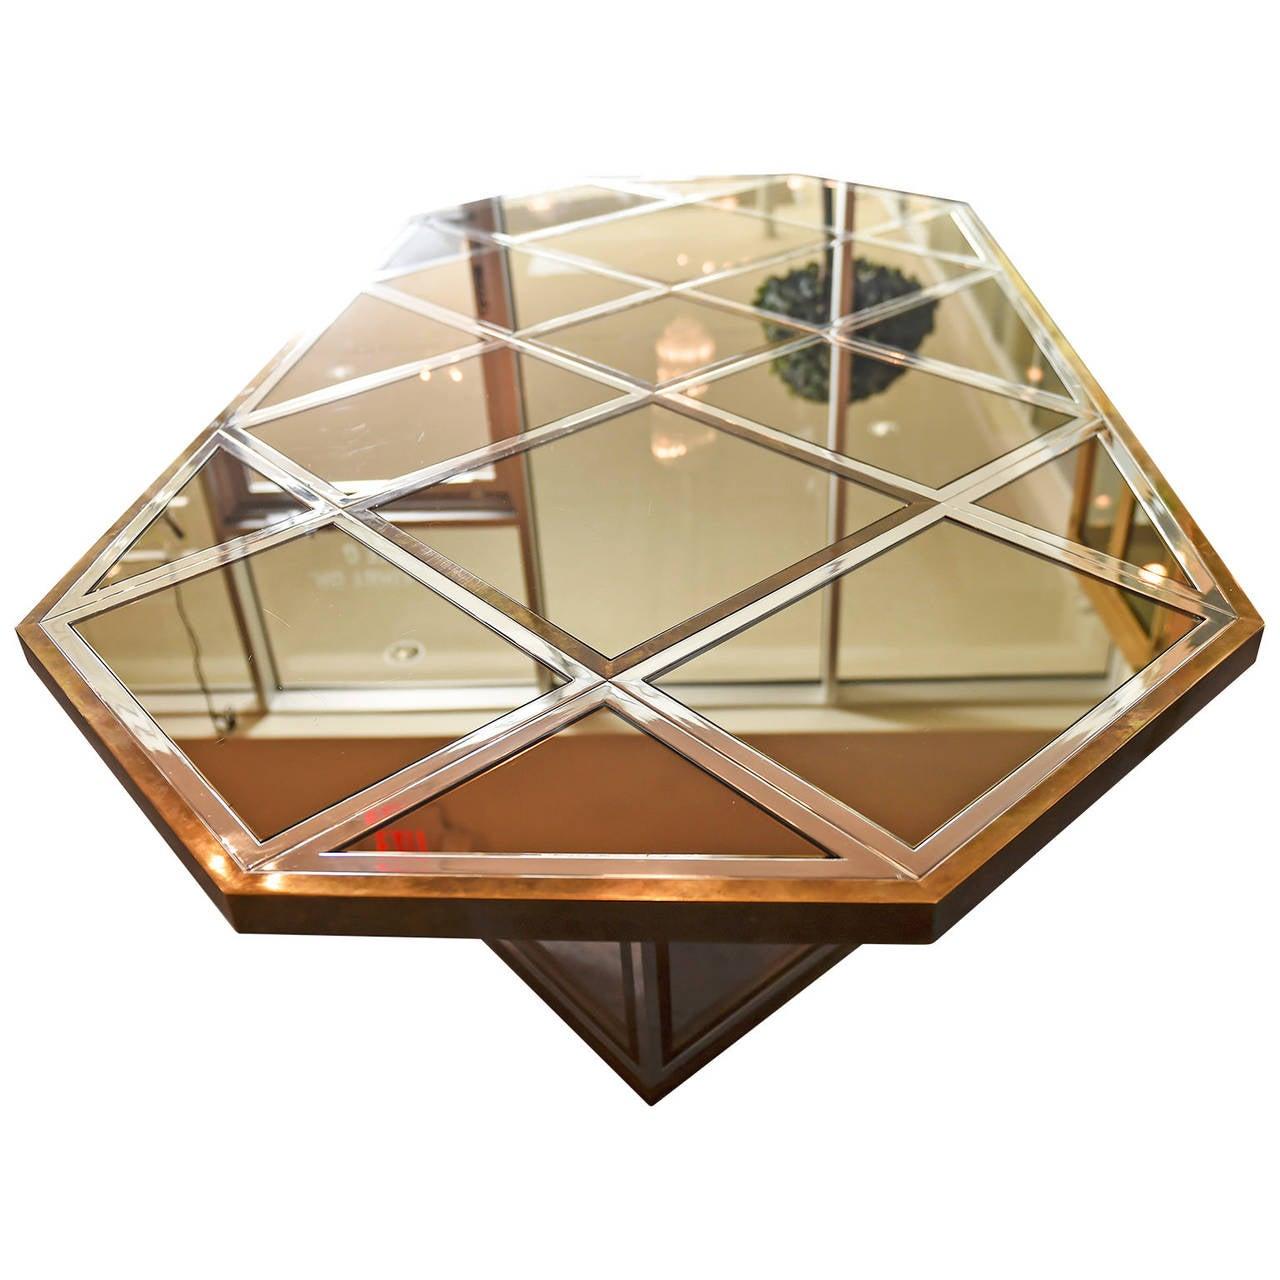 Romeo Rega Brass, Chrome & Cut Glass Mirror Harlequin Style Dining Table / Desk For Sale 1